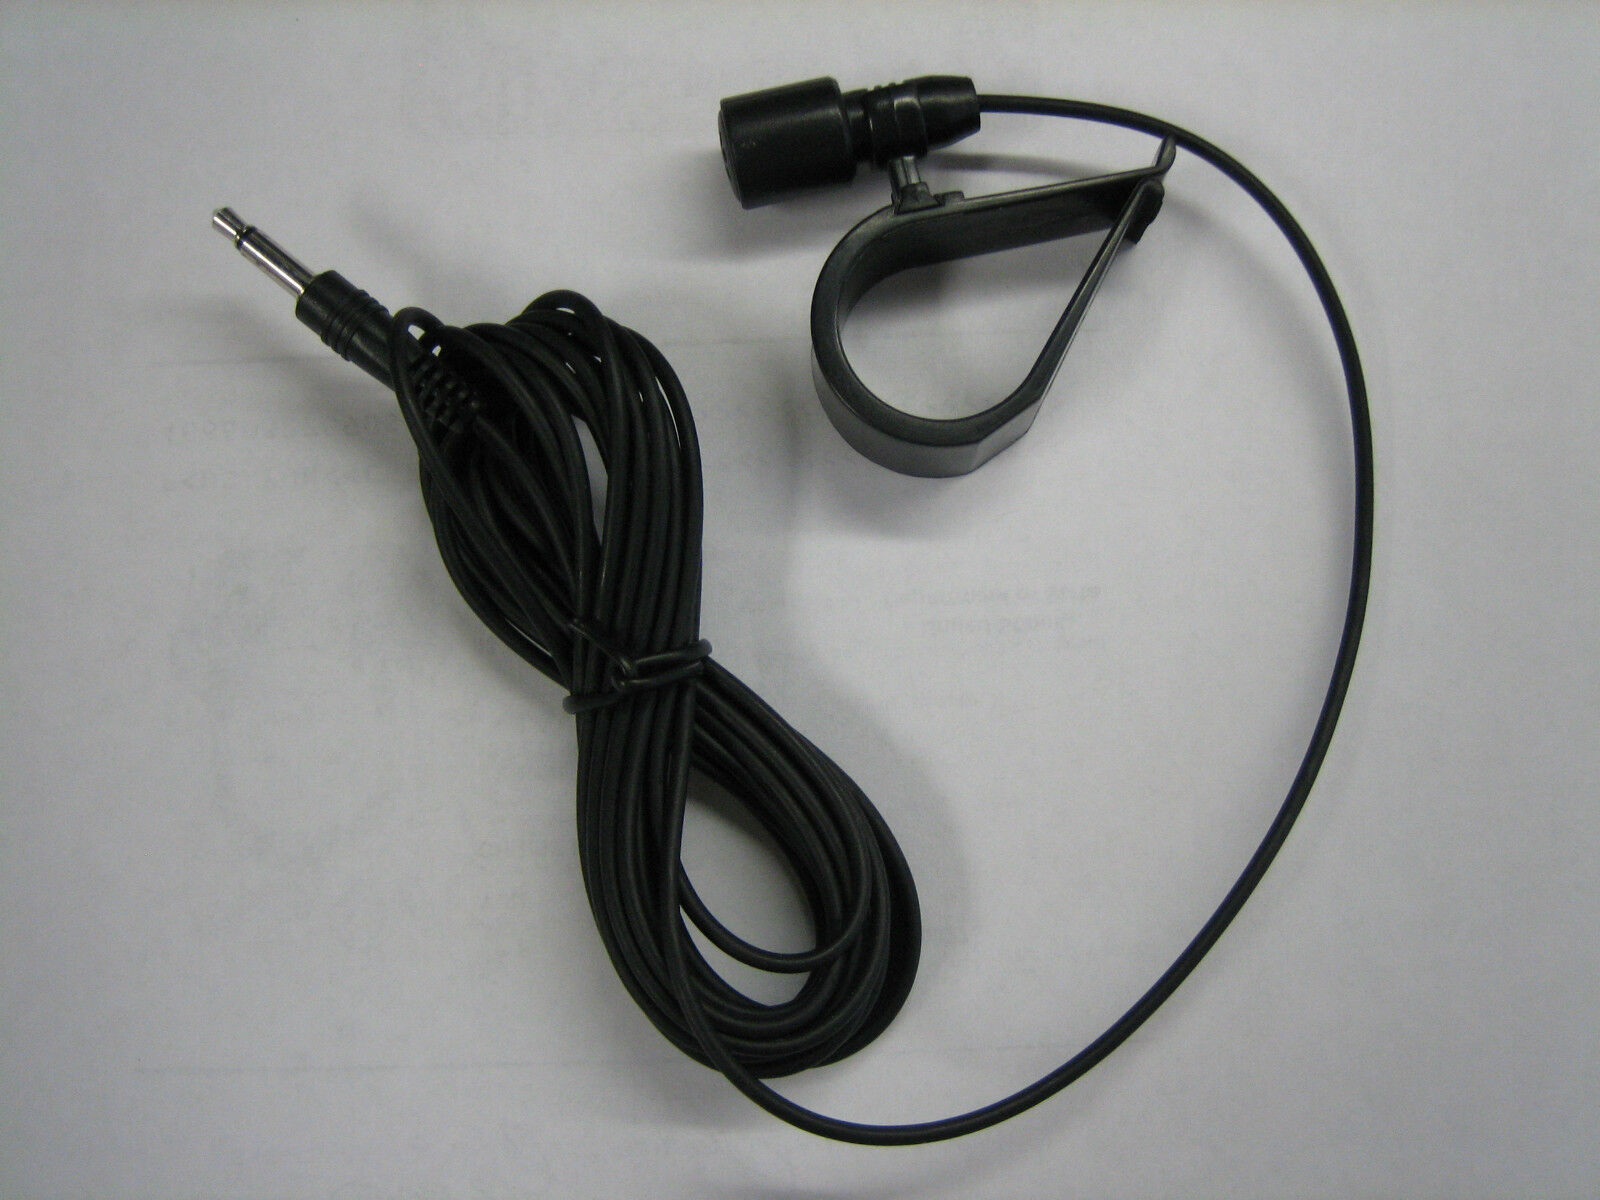 как выглядит JENSEN Bluetooth Mic Phone ASA JRV9000, JRV9000R фото